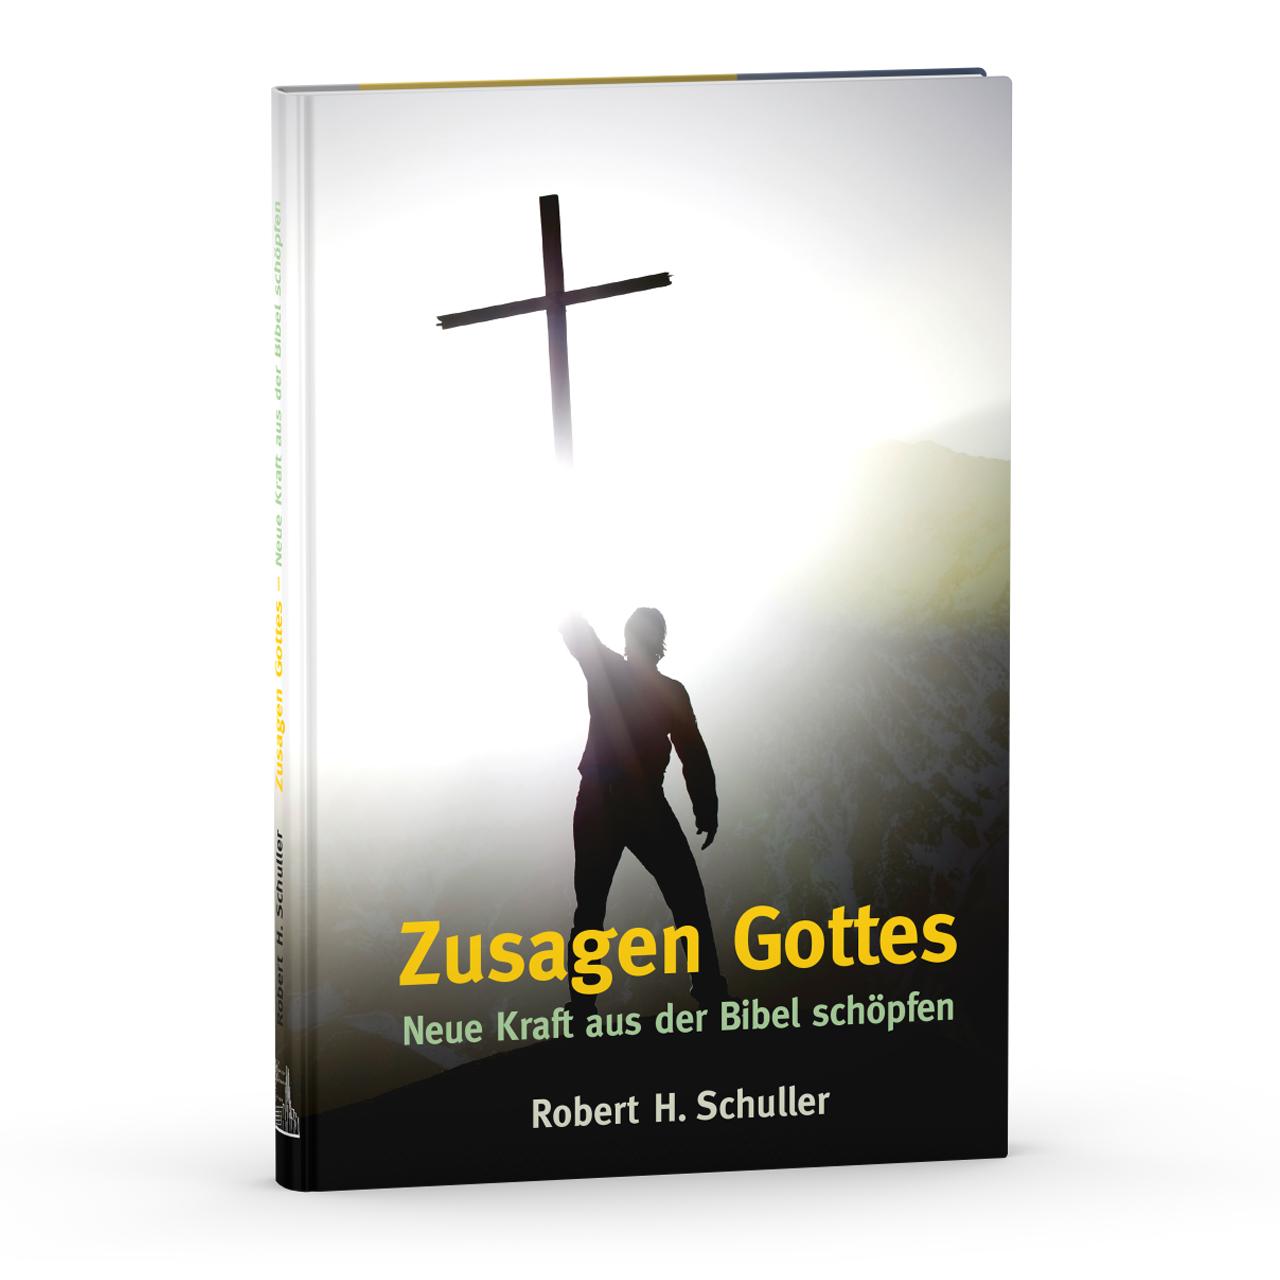 ZusagenGottes_3D